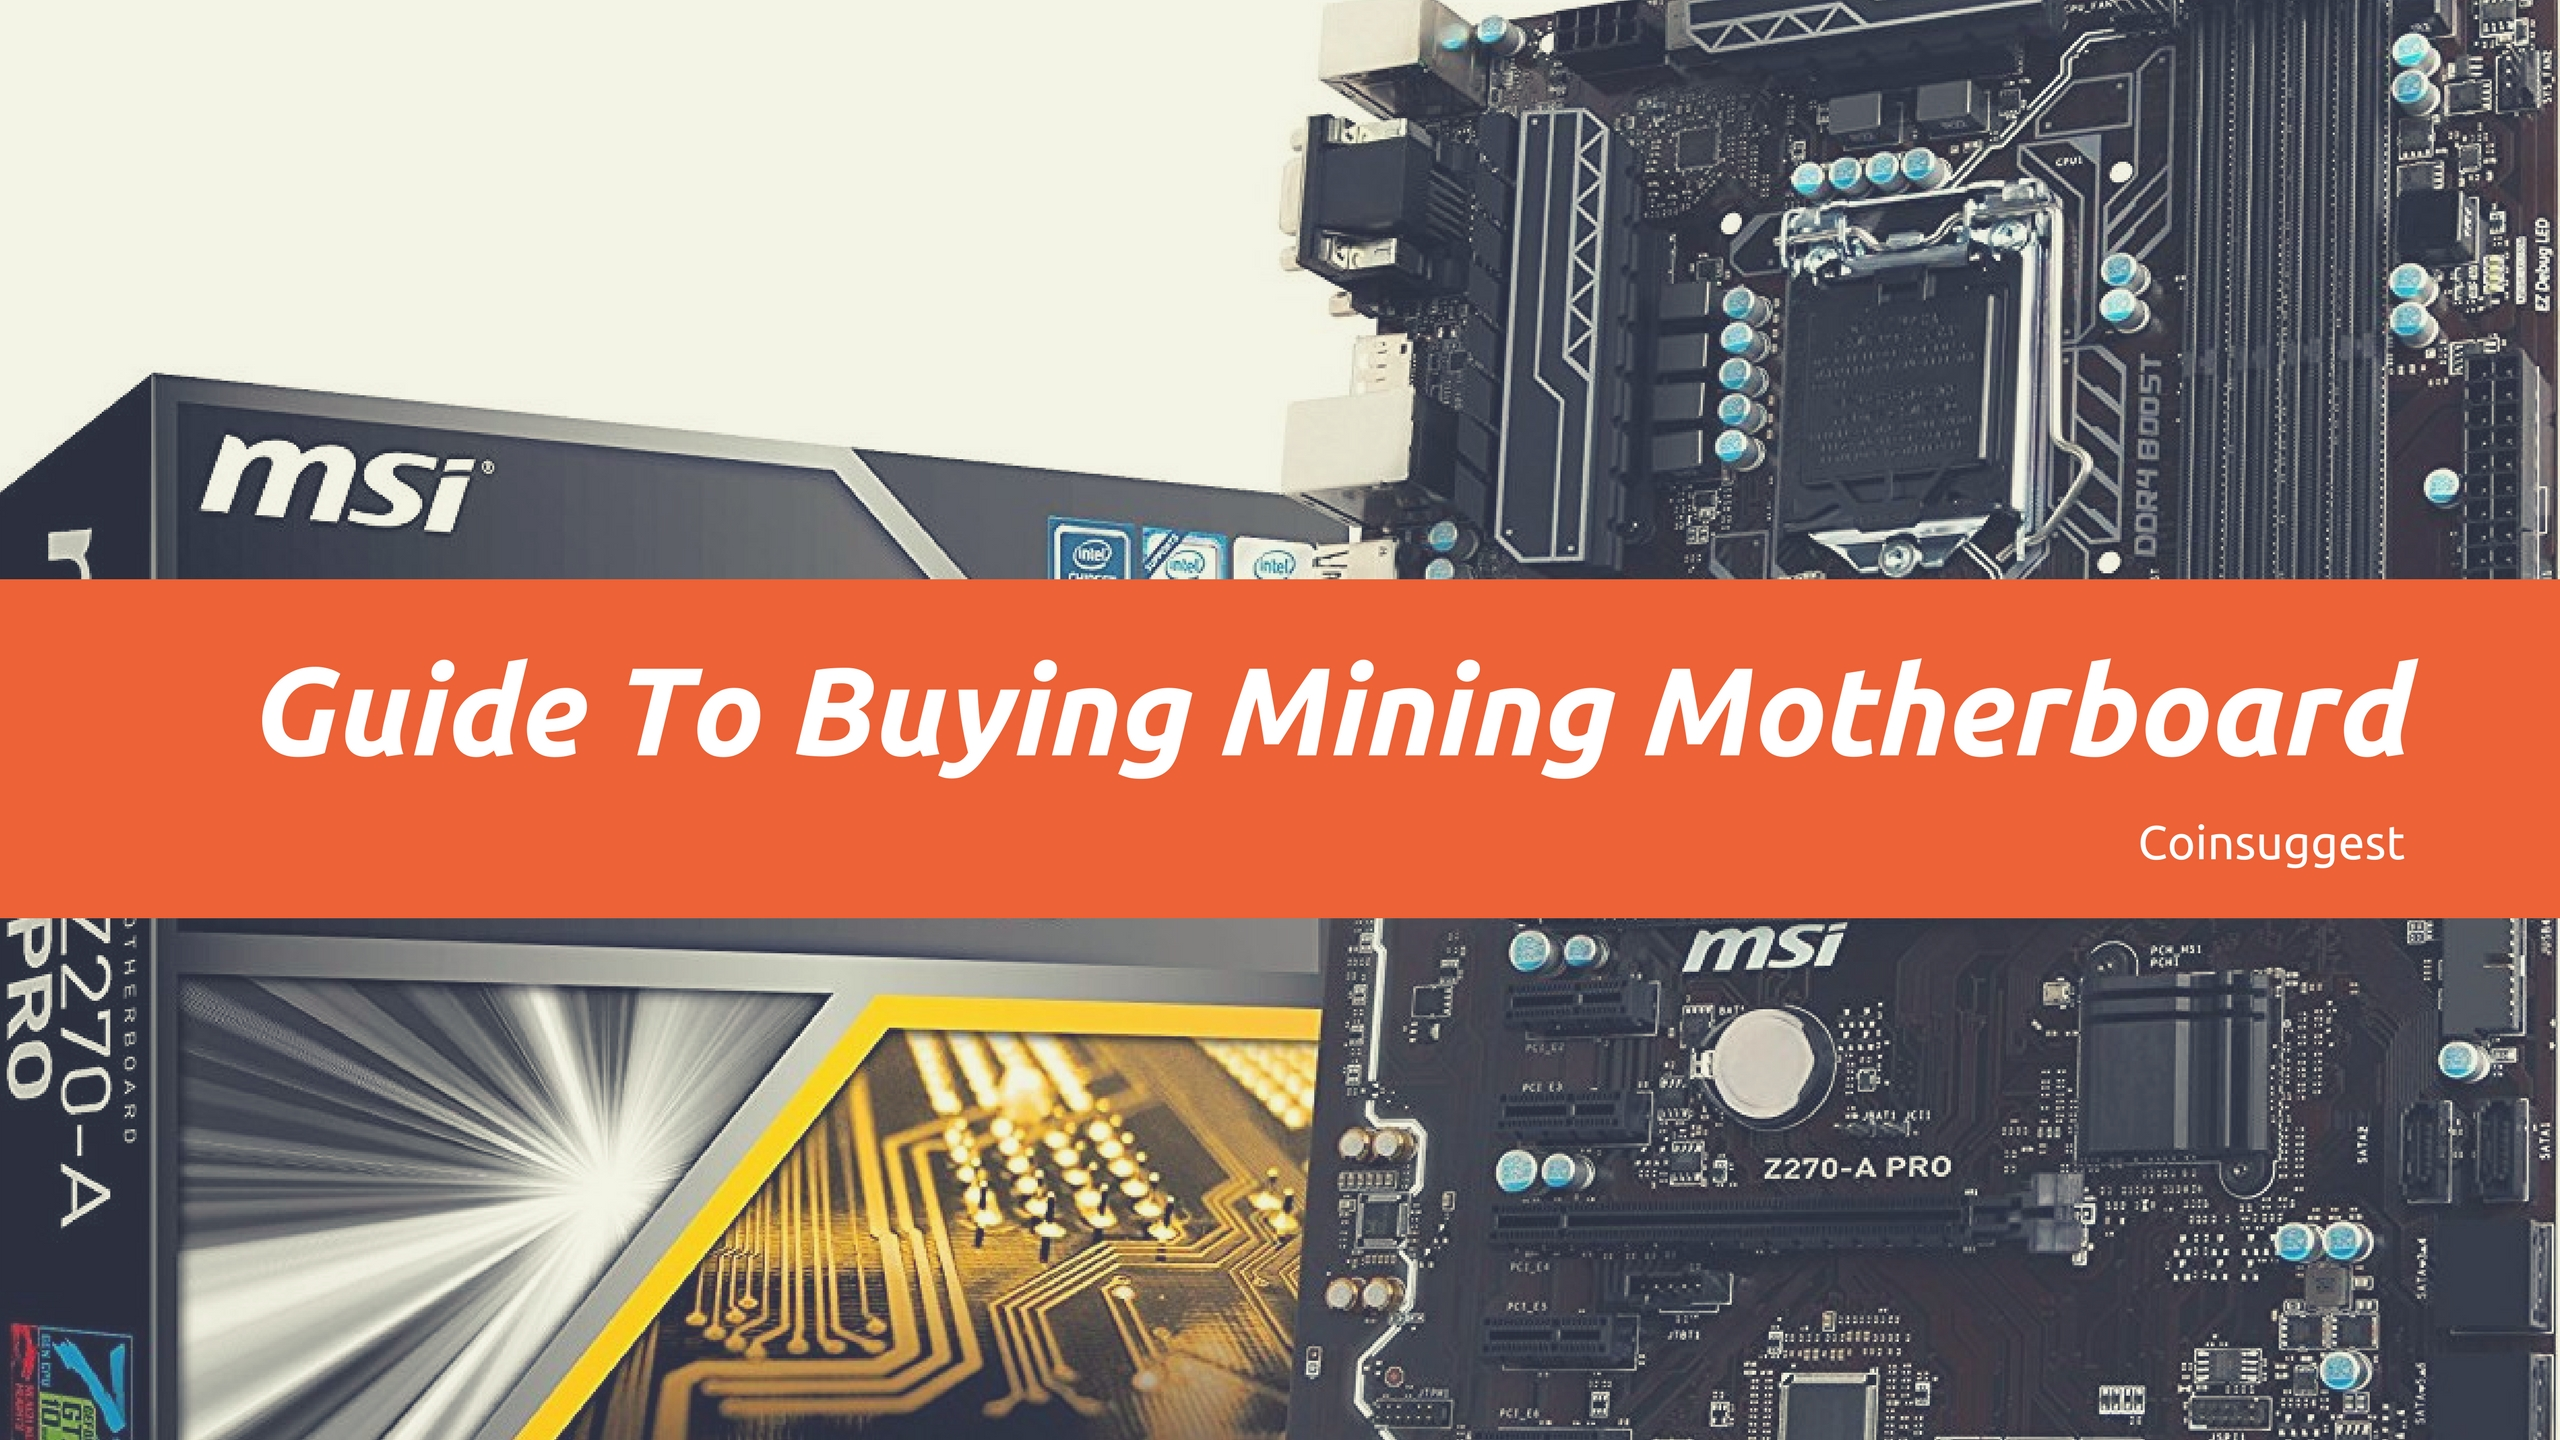 Guide Choosing Gpu Mining Motherboard 2018 Coin Suggest Mobo Biostar Tb250 Btc